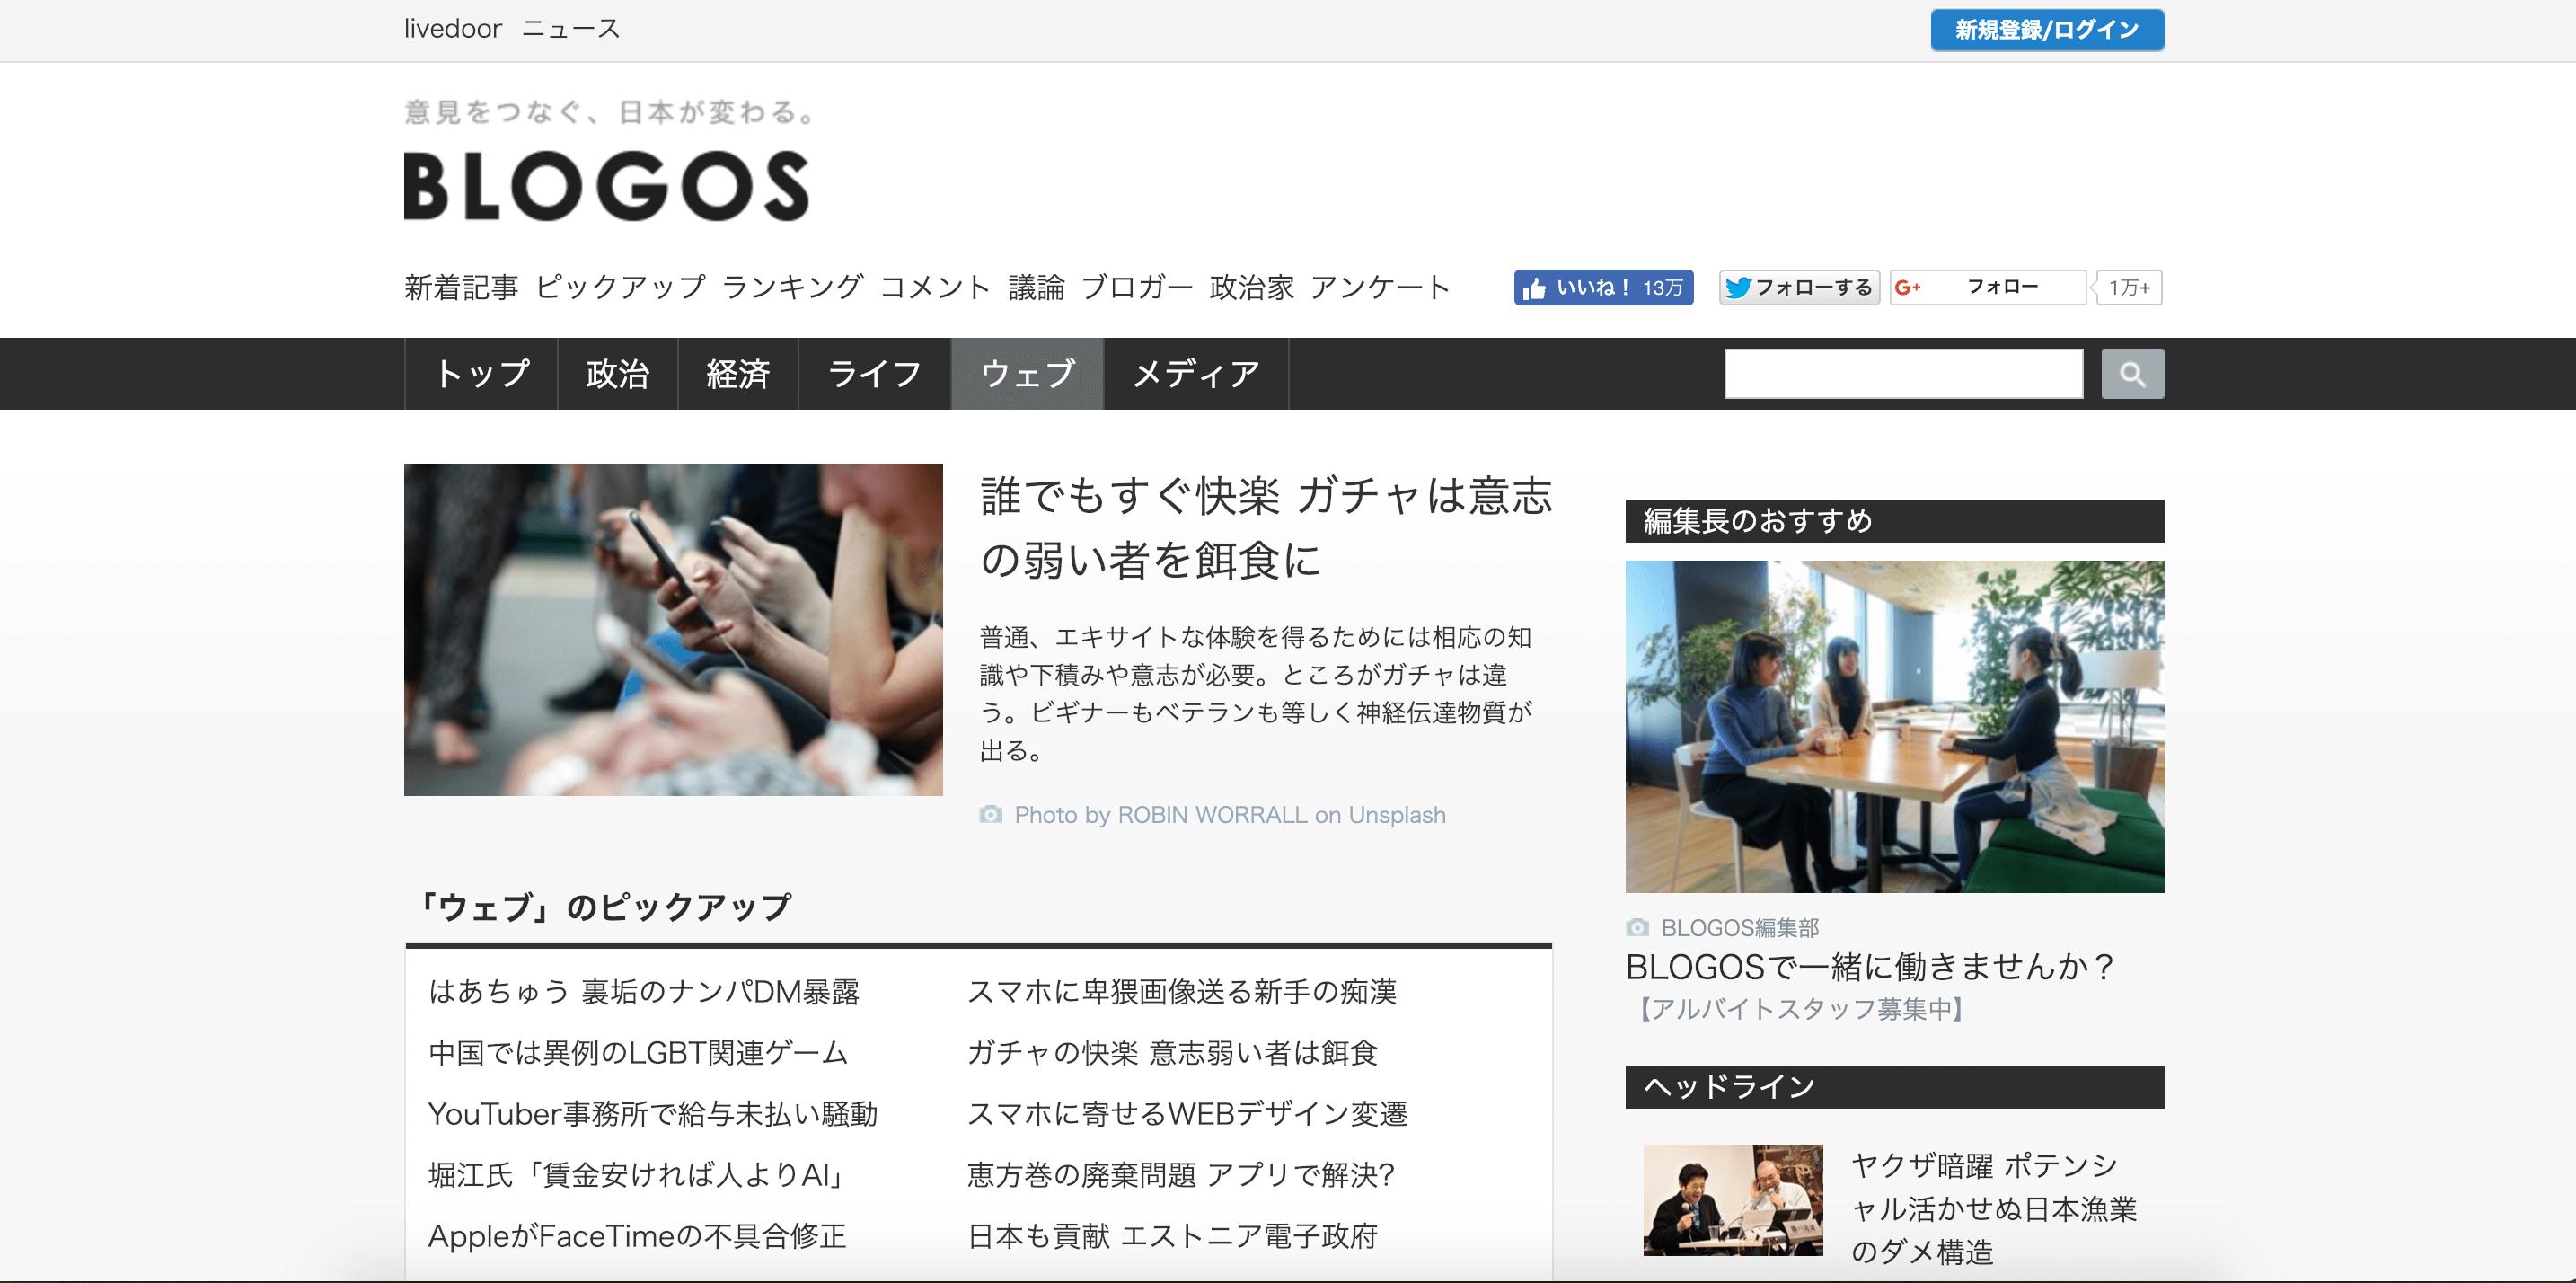 LINE株式会社が運営する日本最大級の提言型ニュースサイトBLOGOS